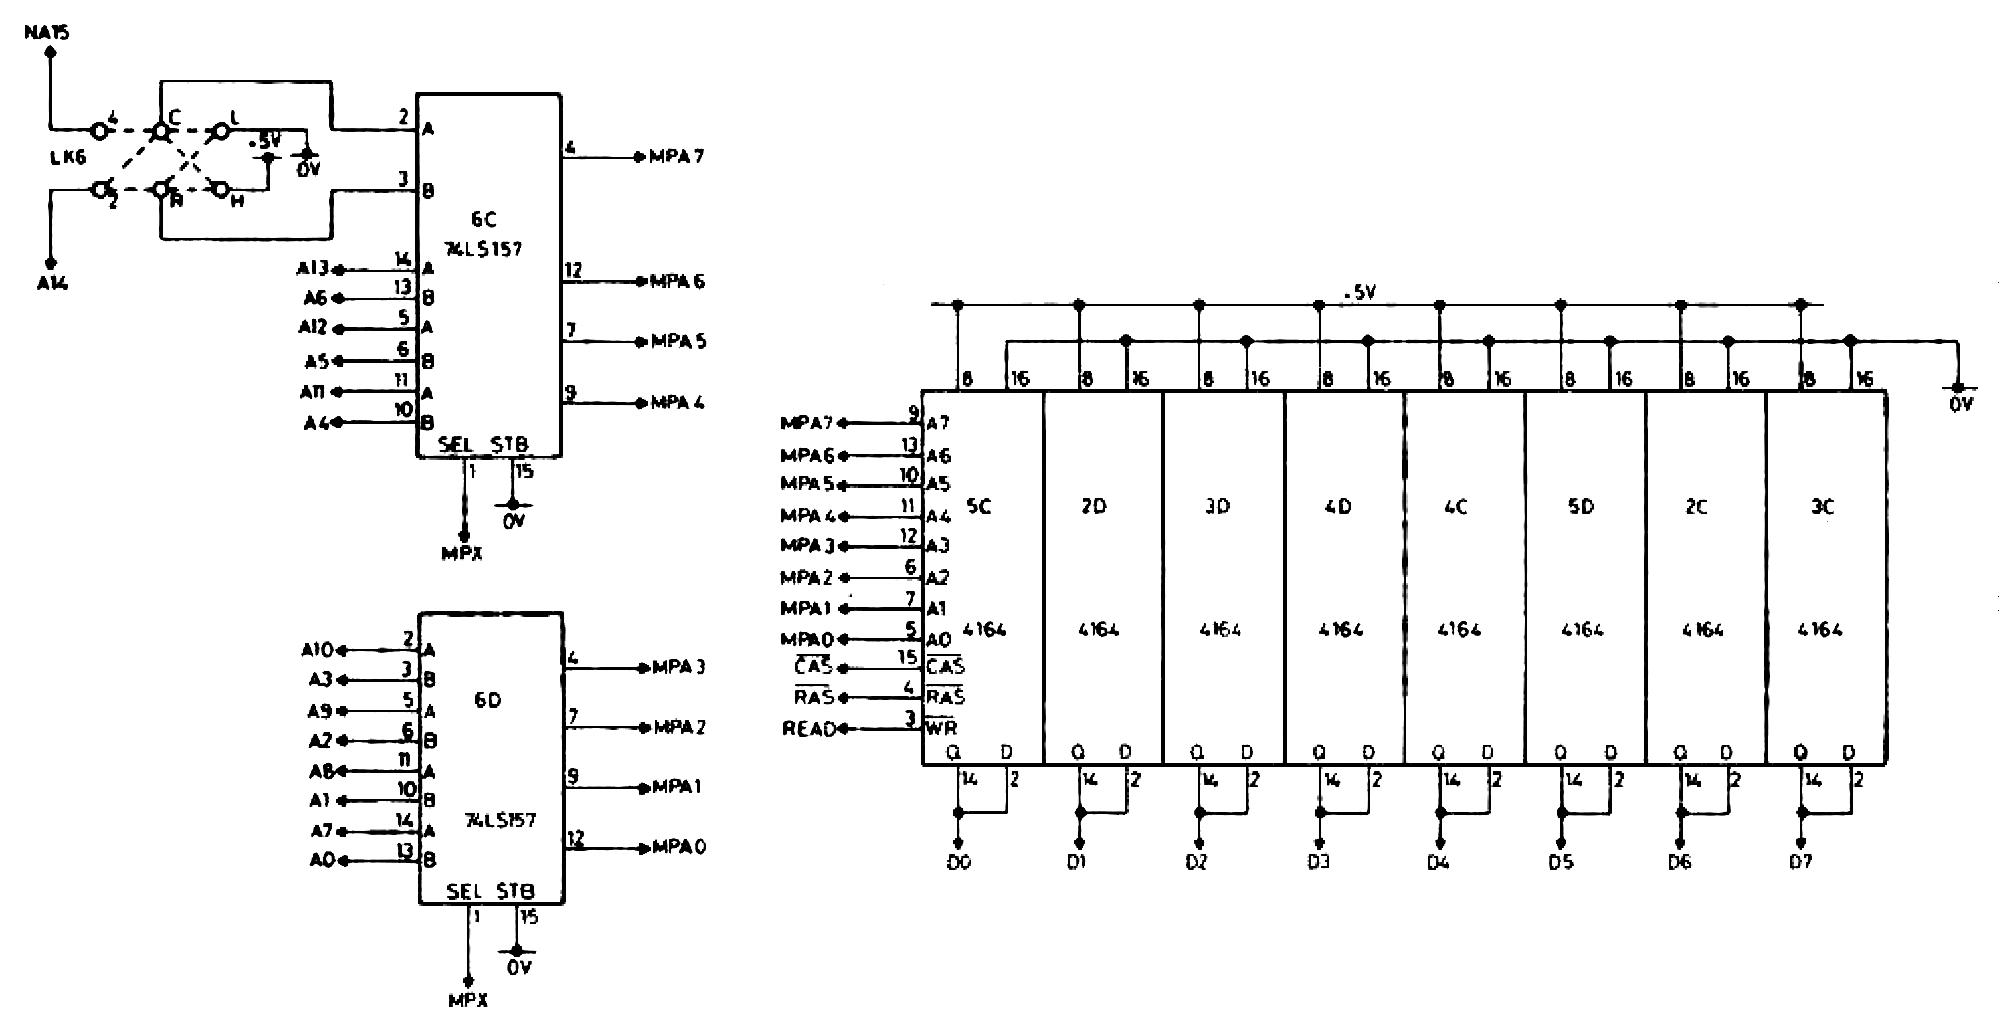 memotech mtx   dram selection / decoding, wiring diagram